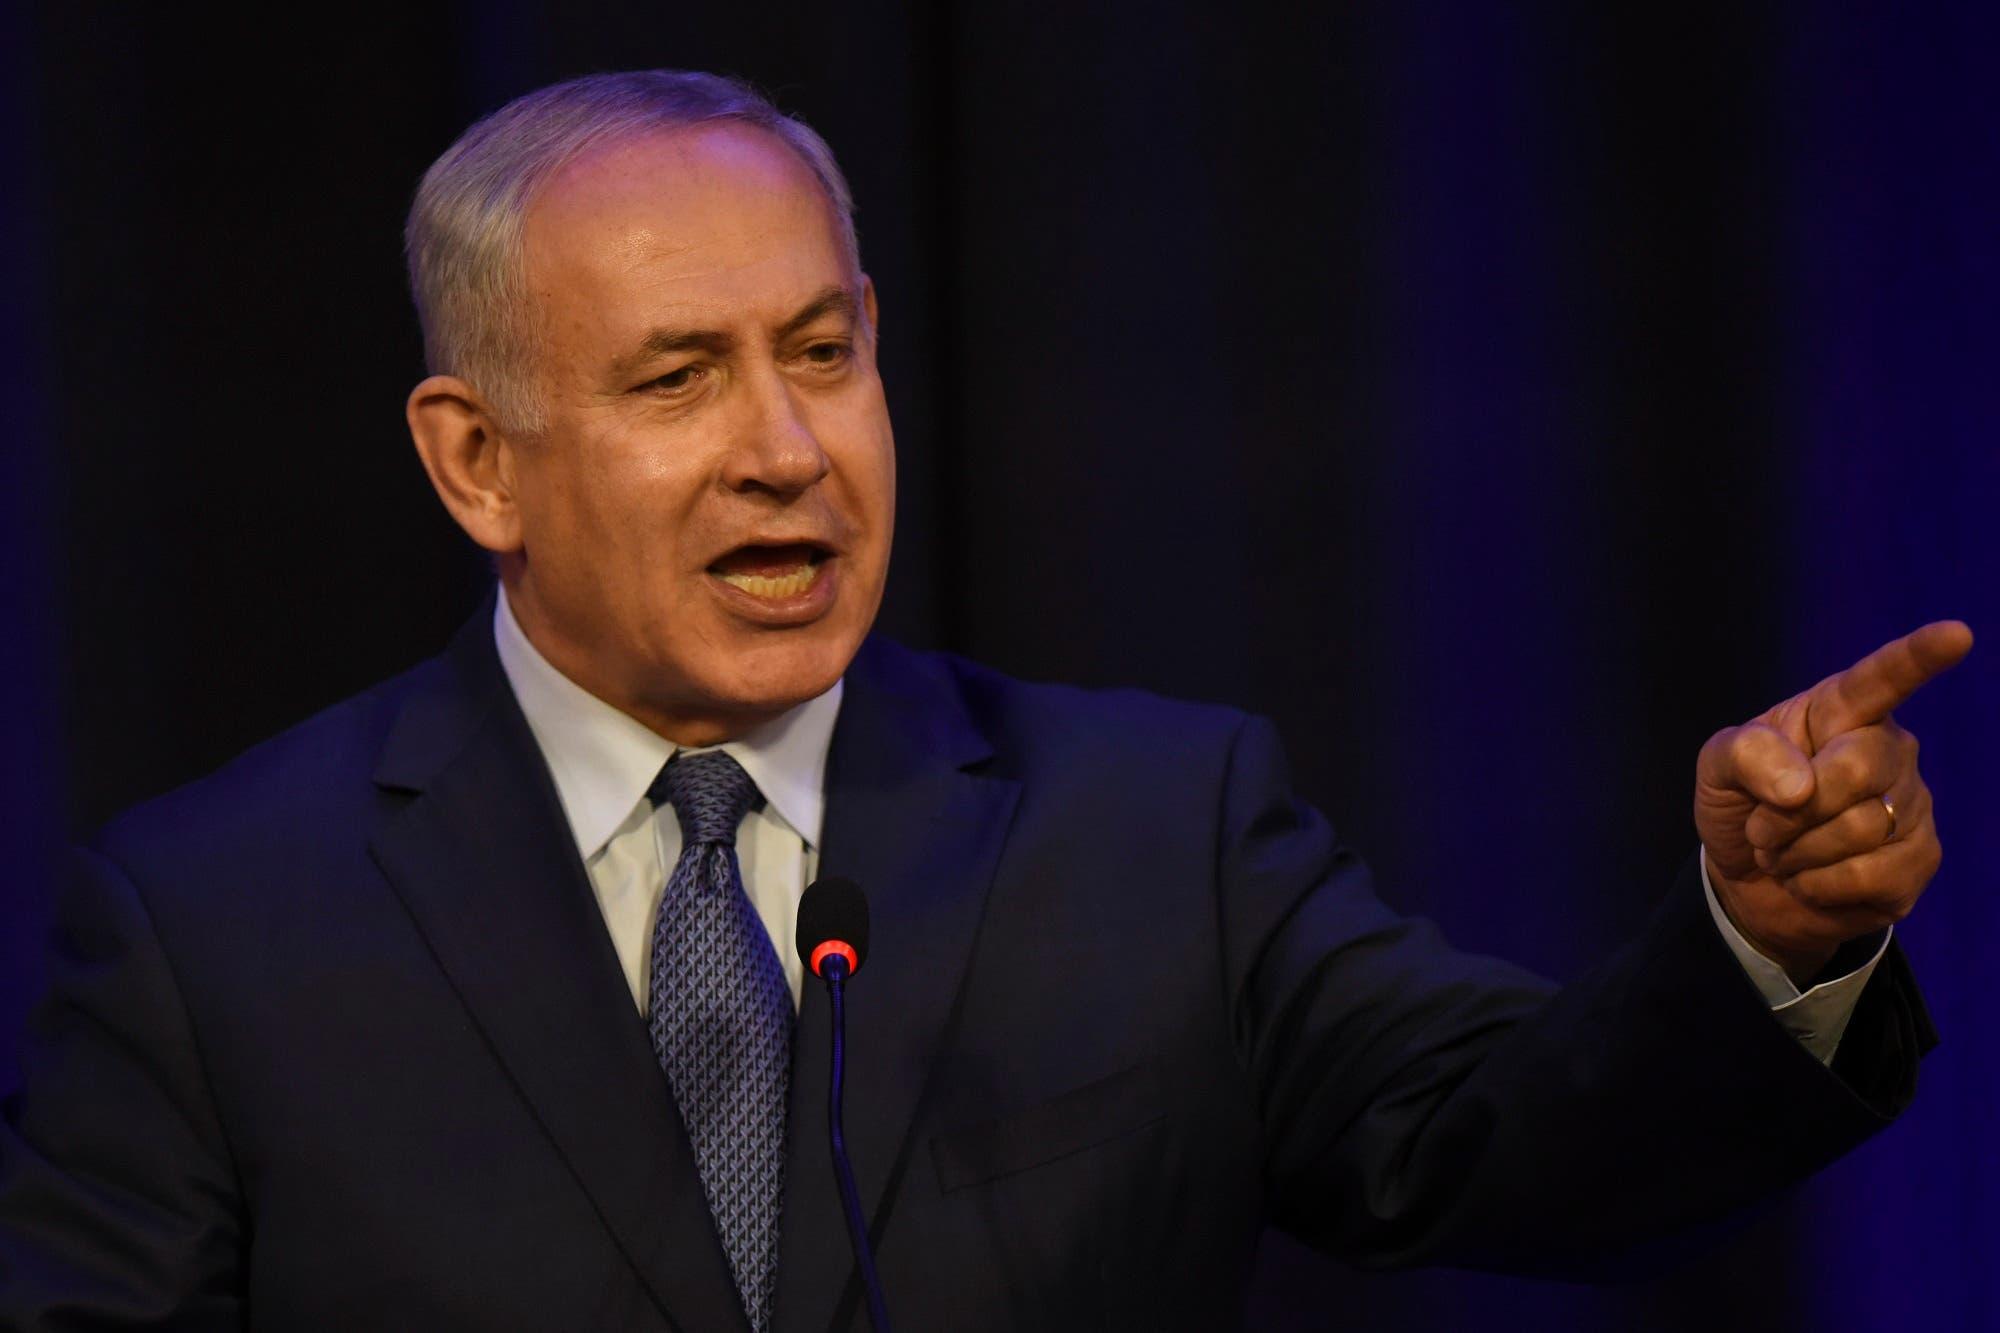 Israeli Prime Minister Benjamin Netanyahu speaks a meeting with businessmen in Buenos Aires, on September 12, 2017. (AFP)